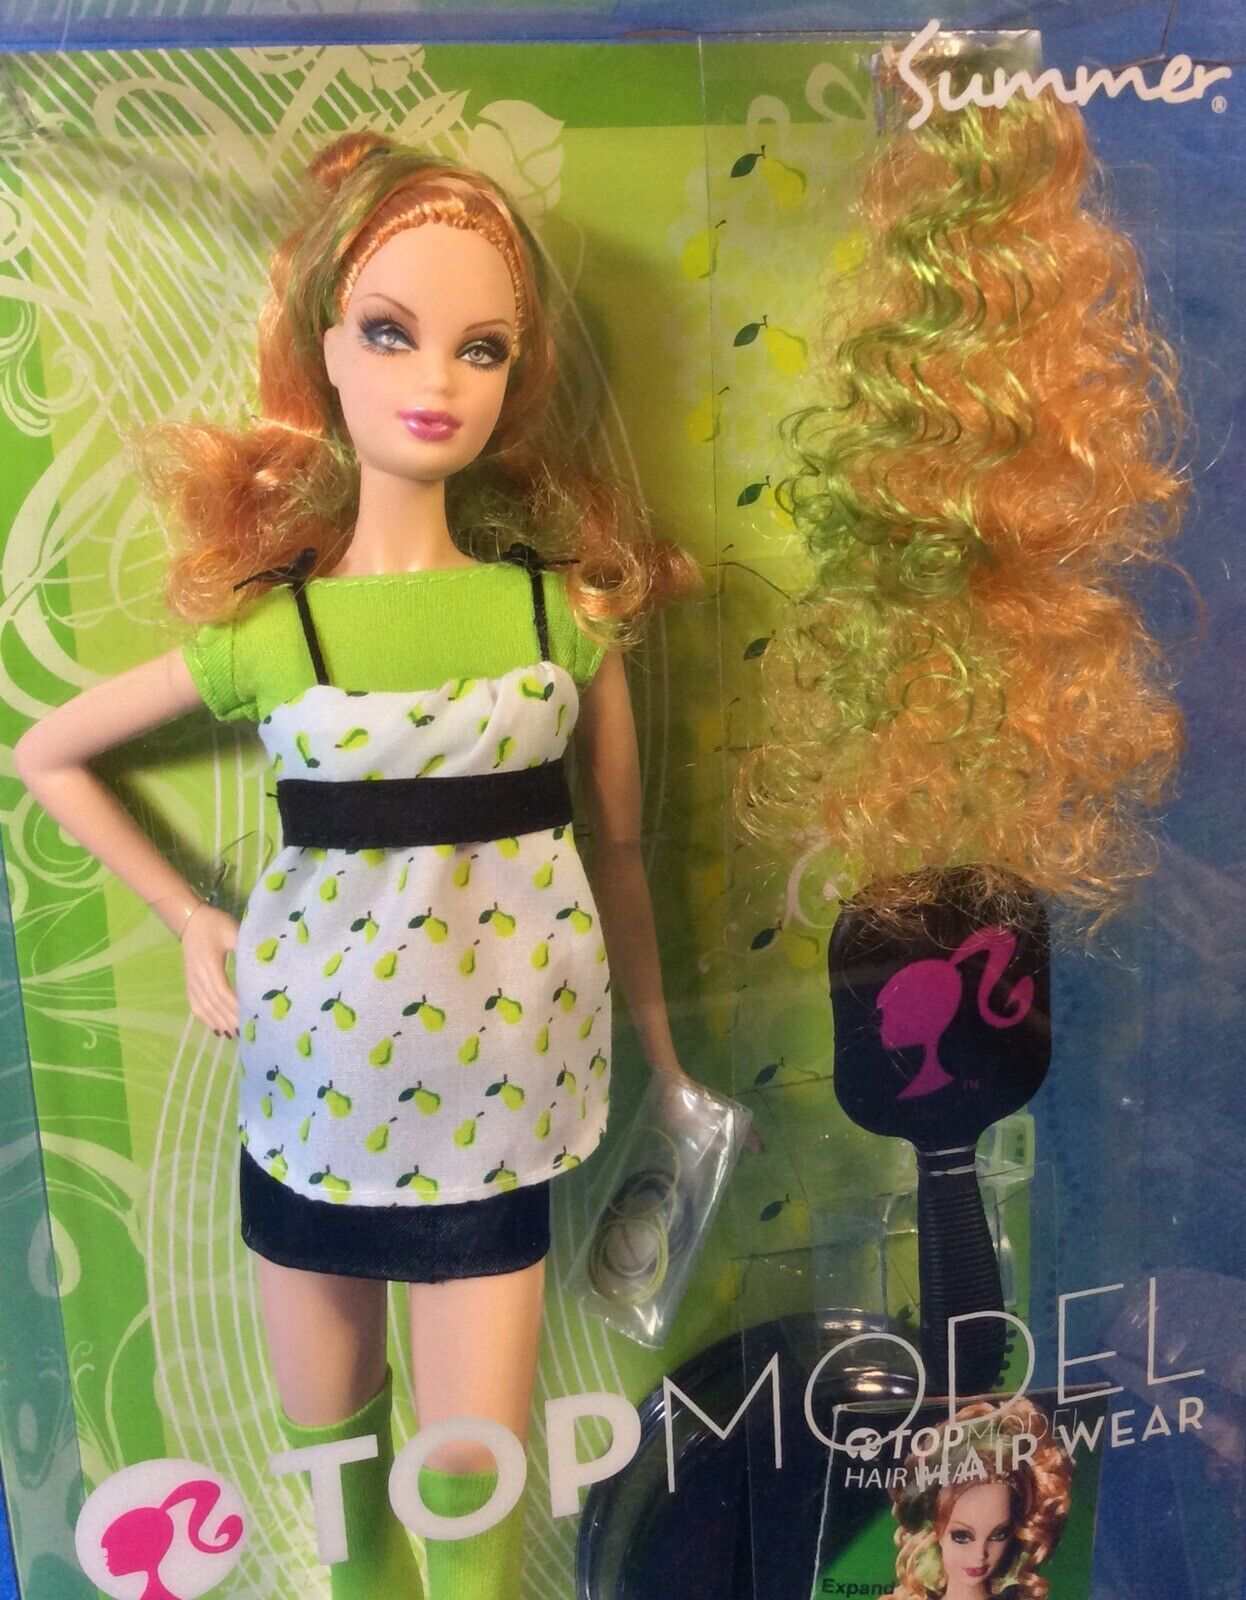 NRFB Doll SUMMER Strawberry Hair TOP MODEL 2007 HAIR WEAR Barbie Friend #M5796